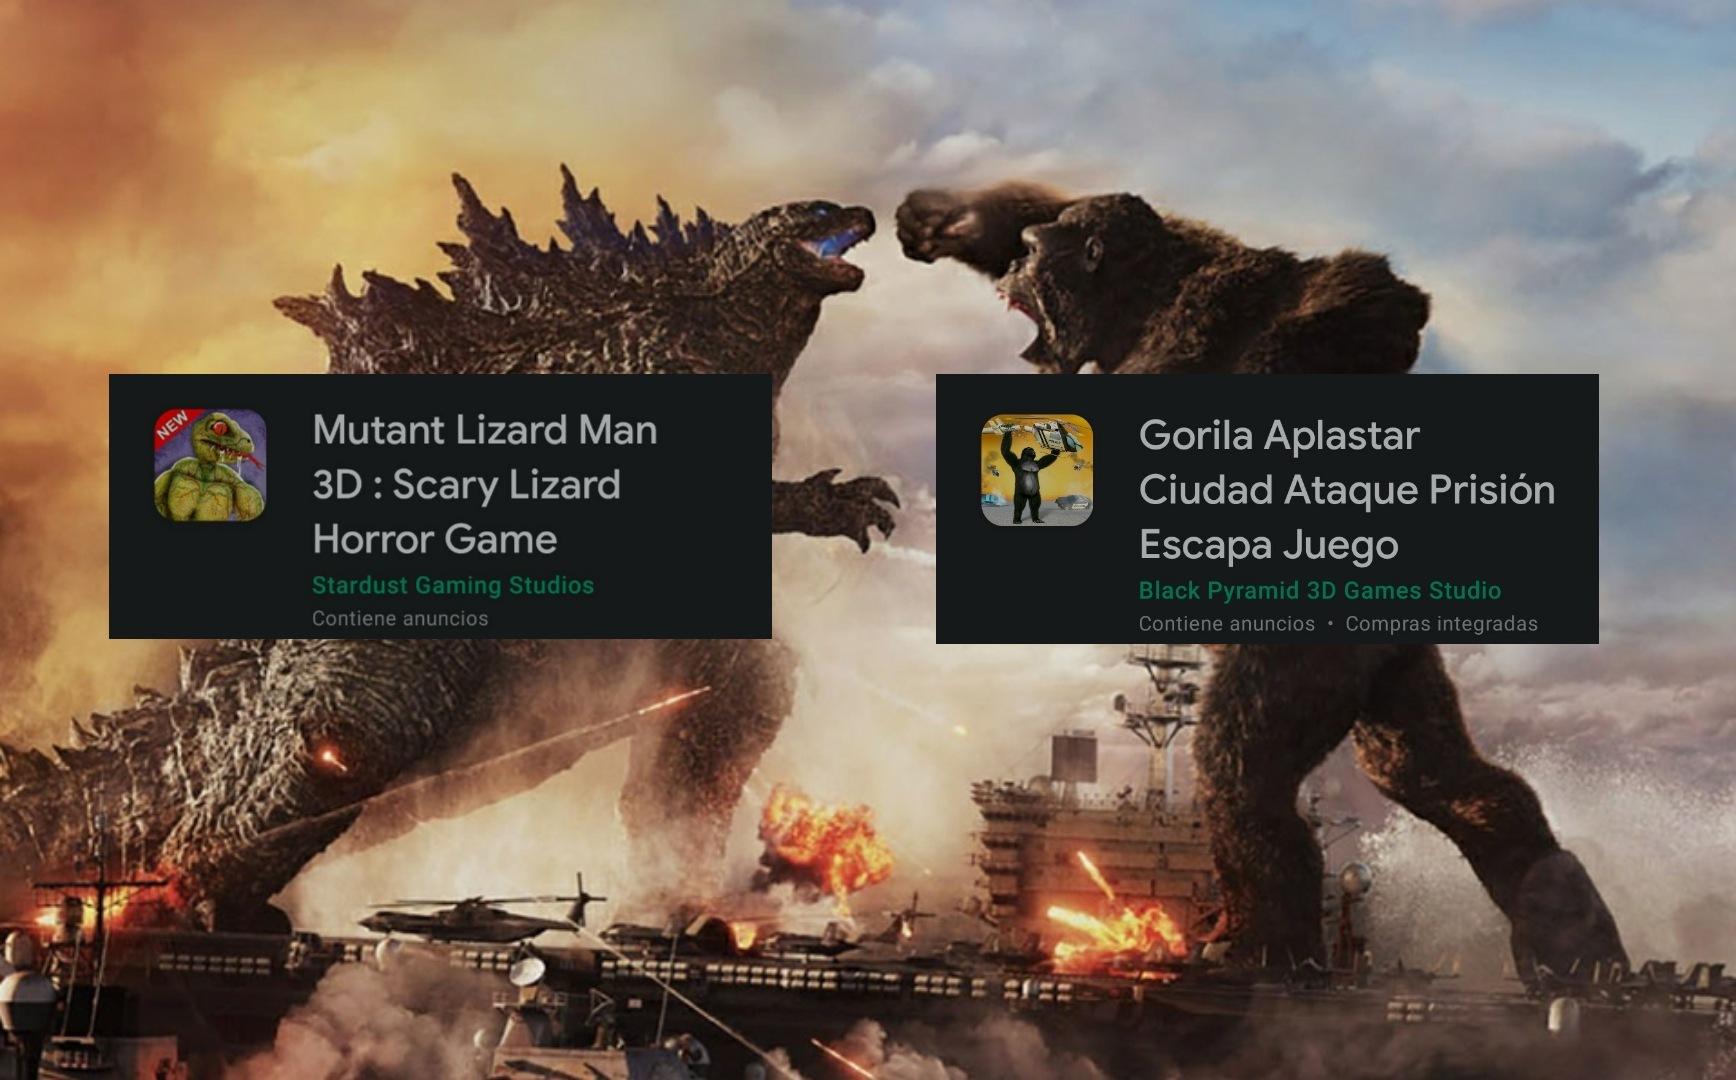 Godzilla vs kong está quemadísimo - meme